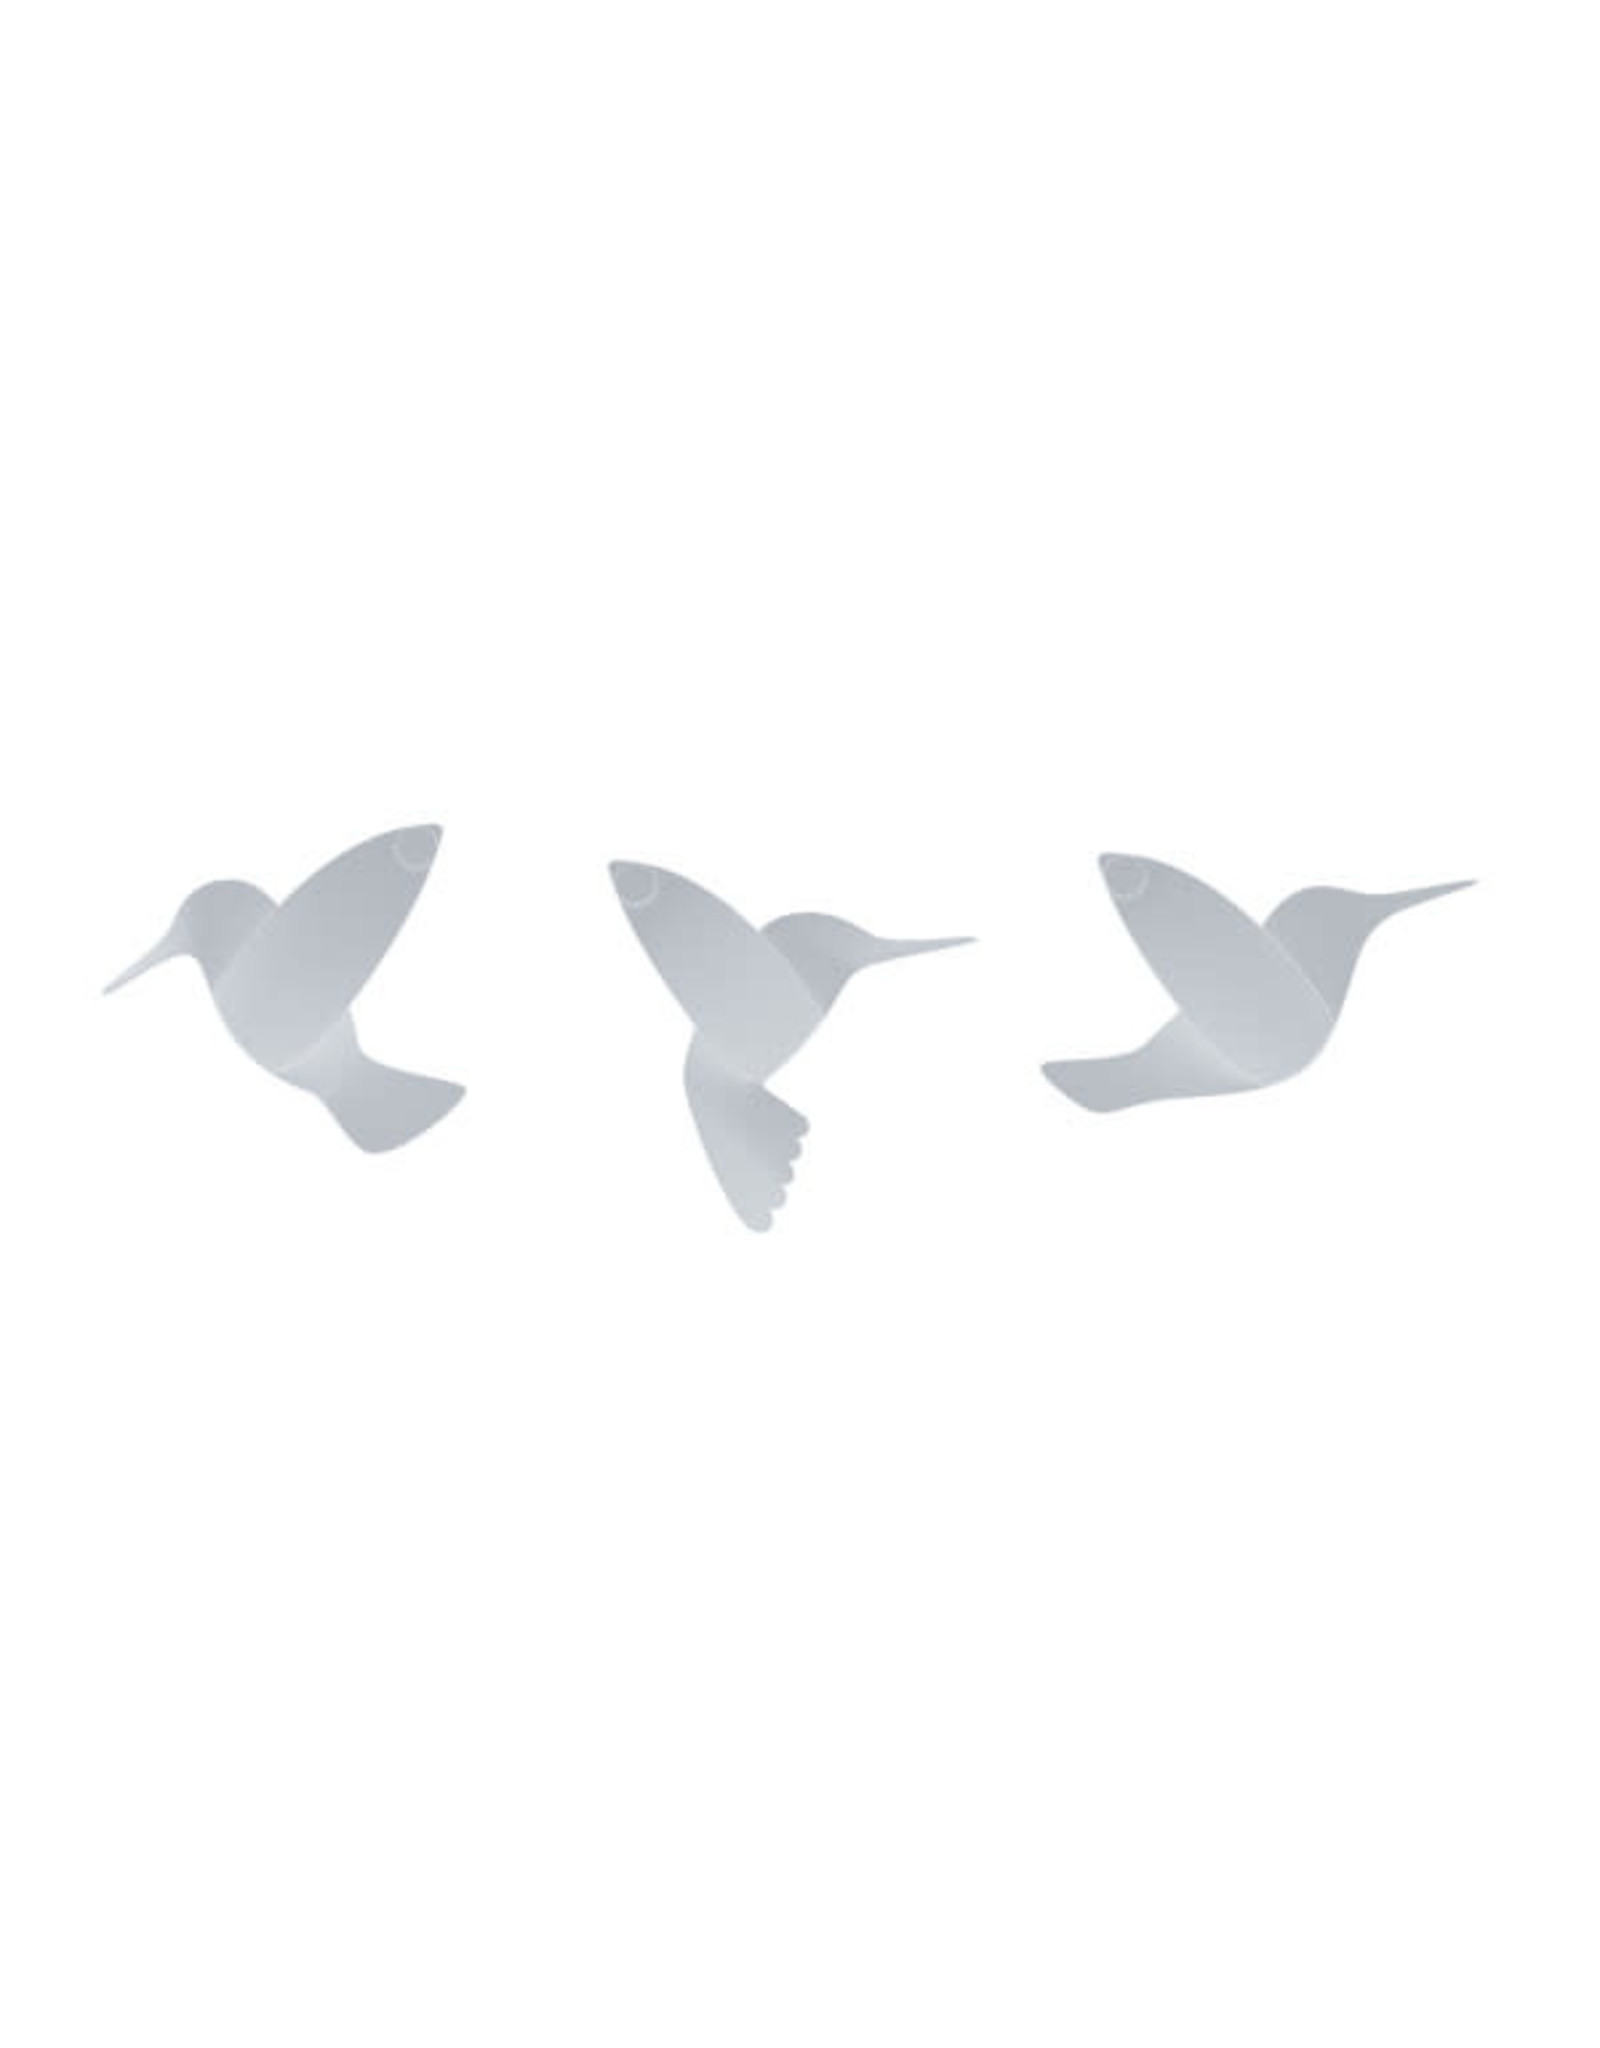 Umbra muurdeco - kolibrie (wit)